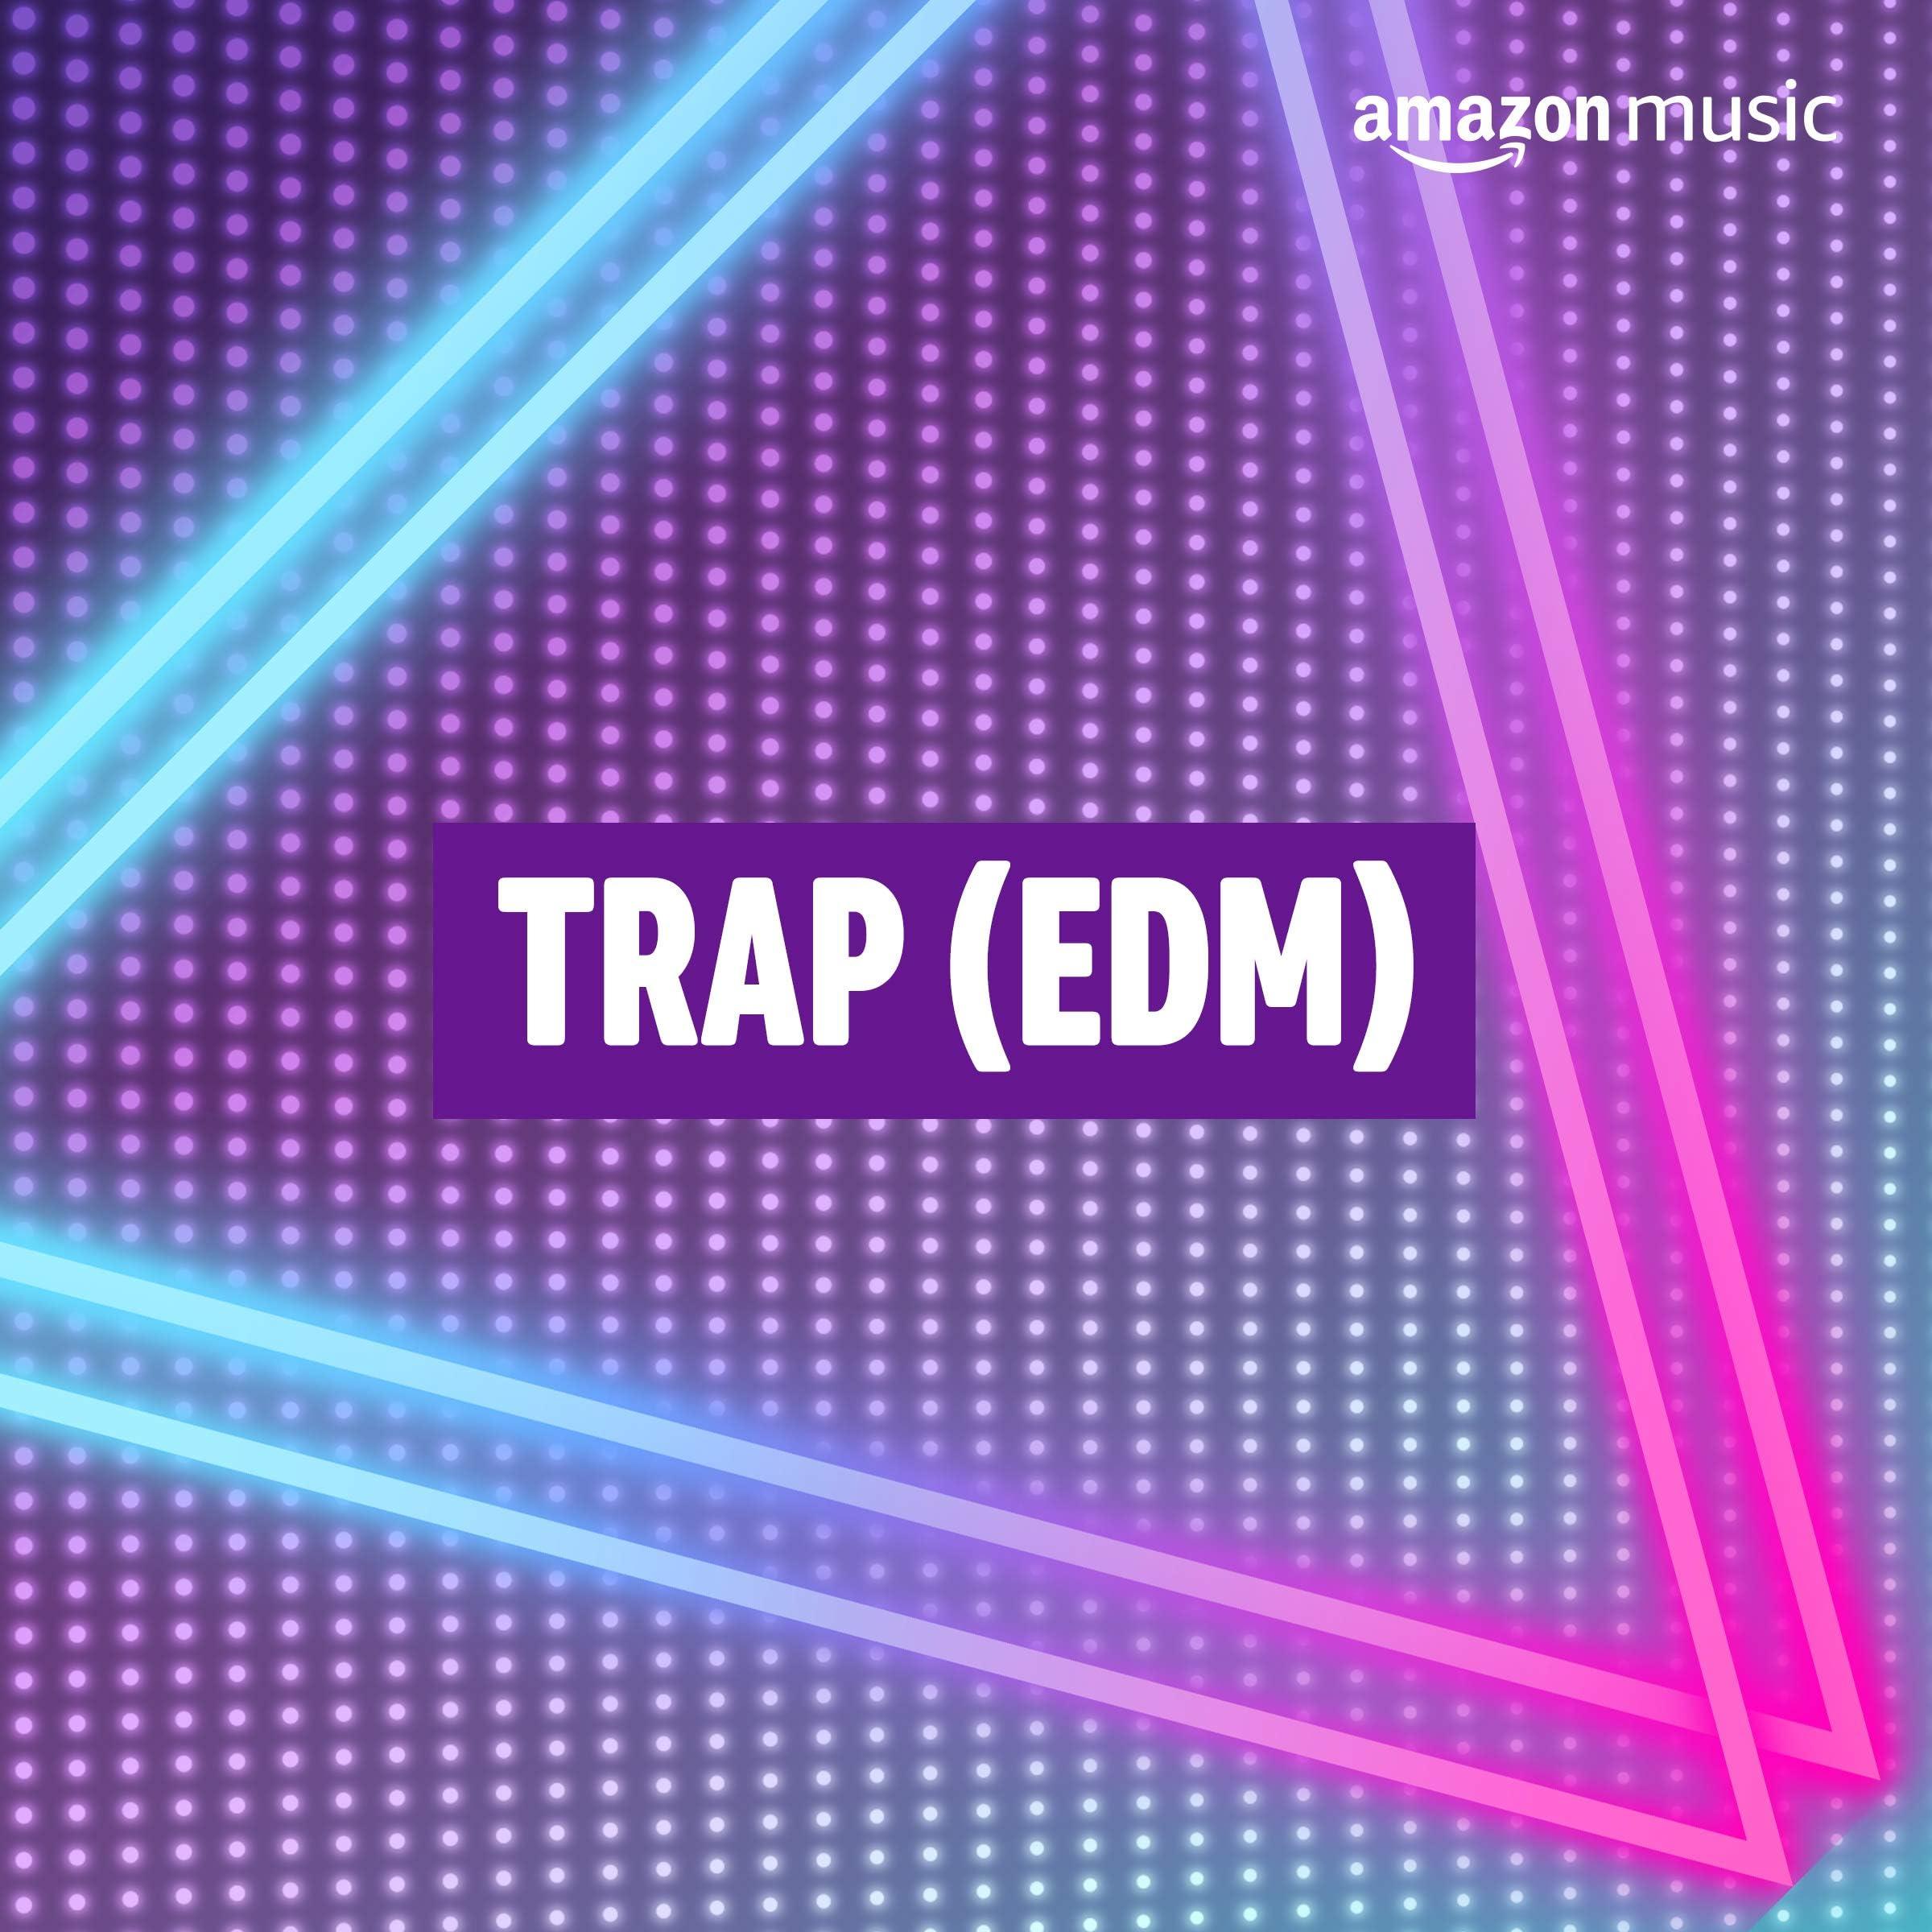 Trap (EDM)